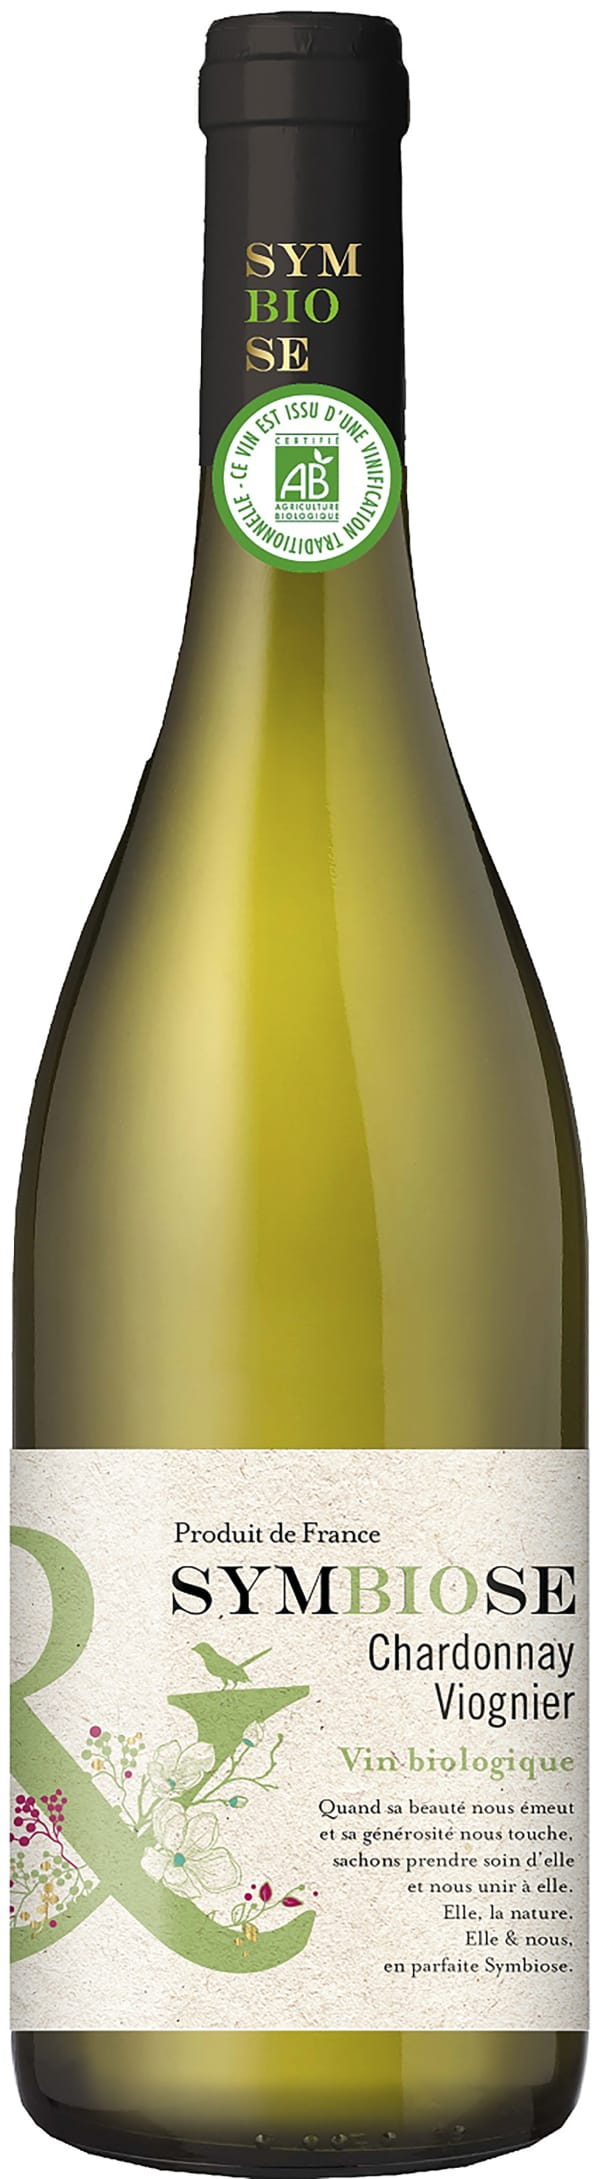 Symbiose Organic Chardonnay Viognier 2018